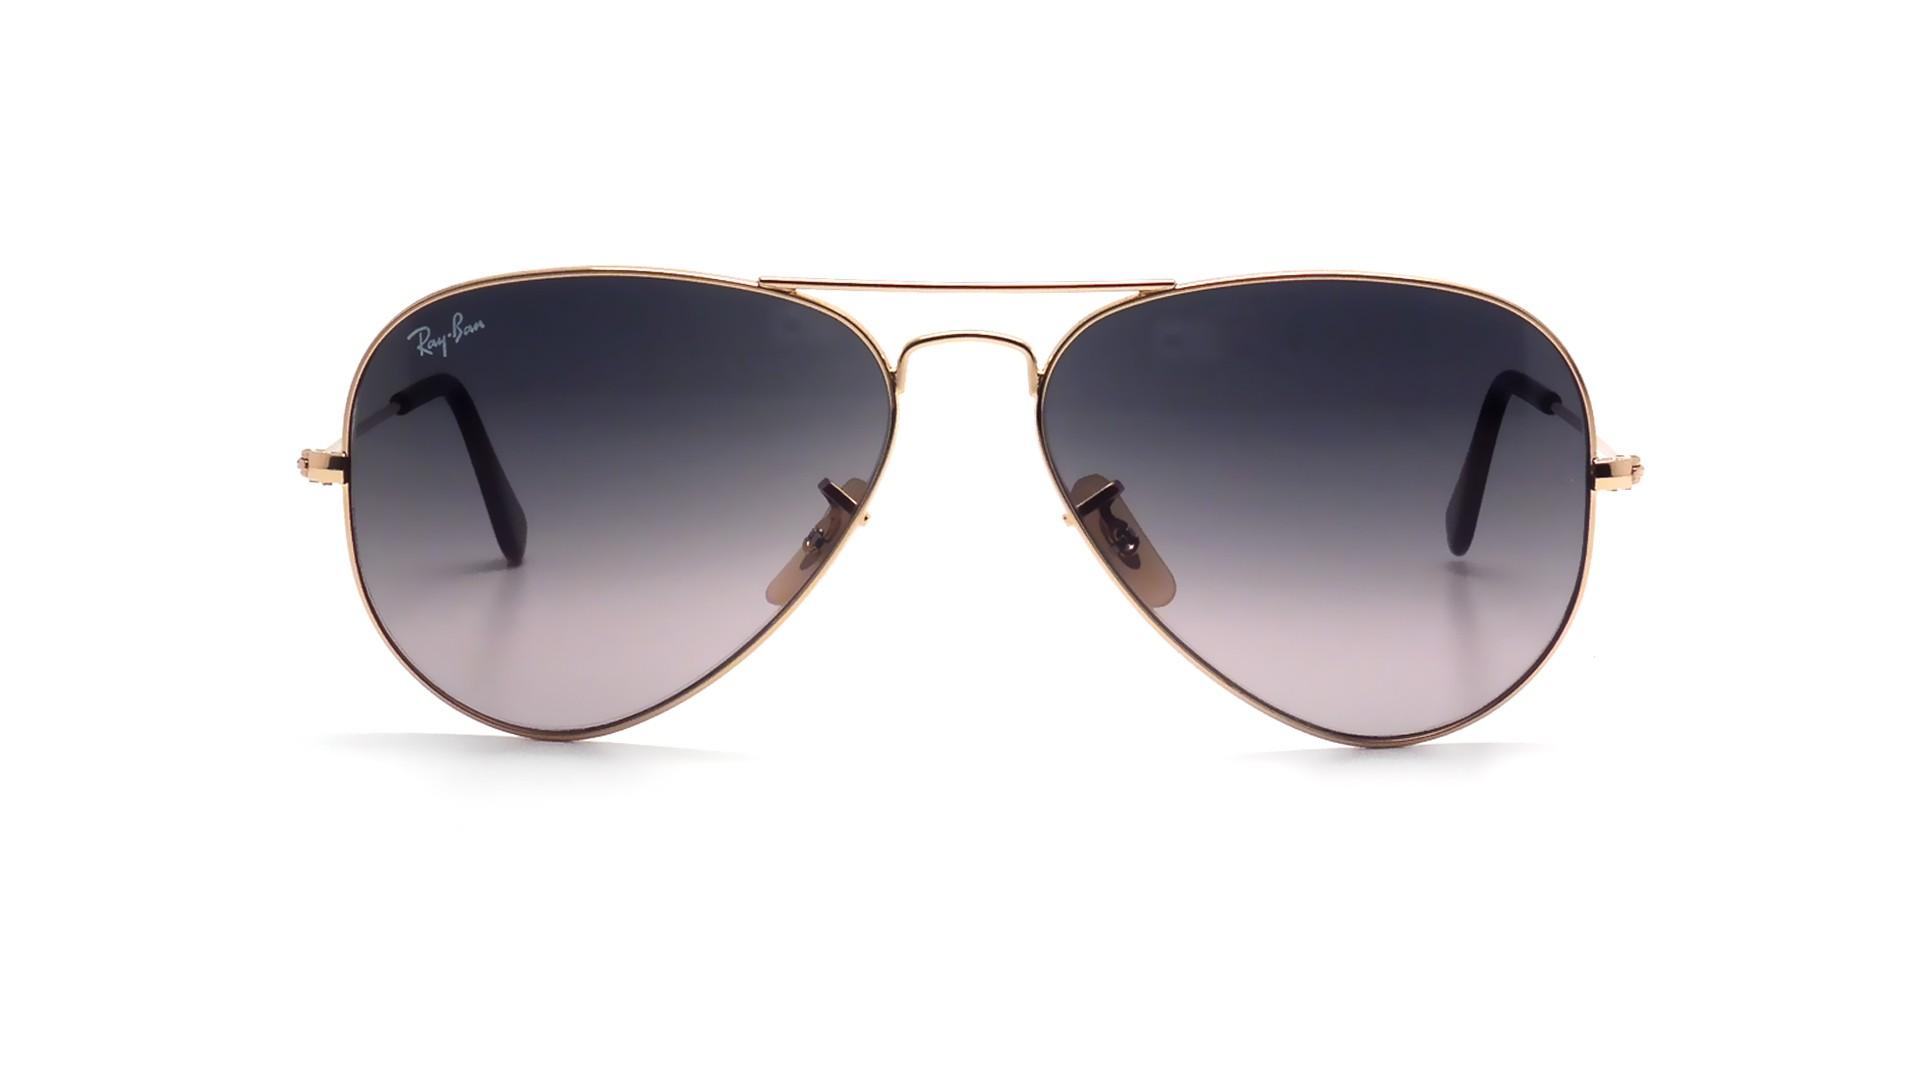 31dd4b108b Sunglasses Ray-Ban Aviator Large Metal Gold RB3025 181 71 58-14 Large  Gradient